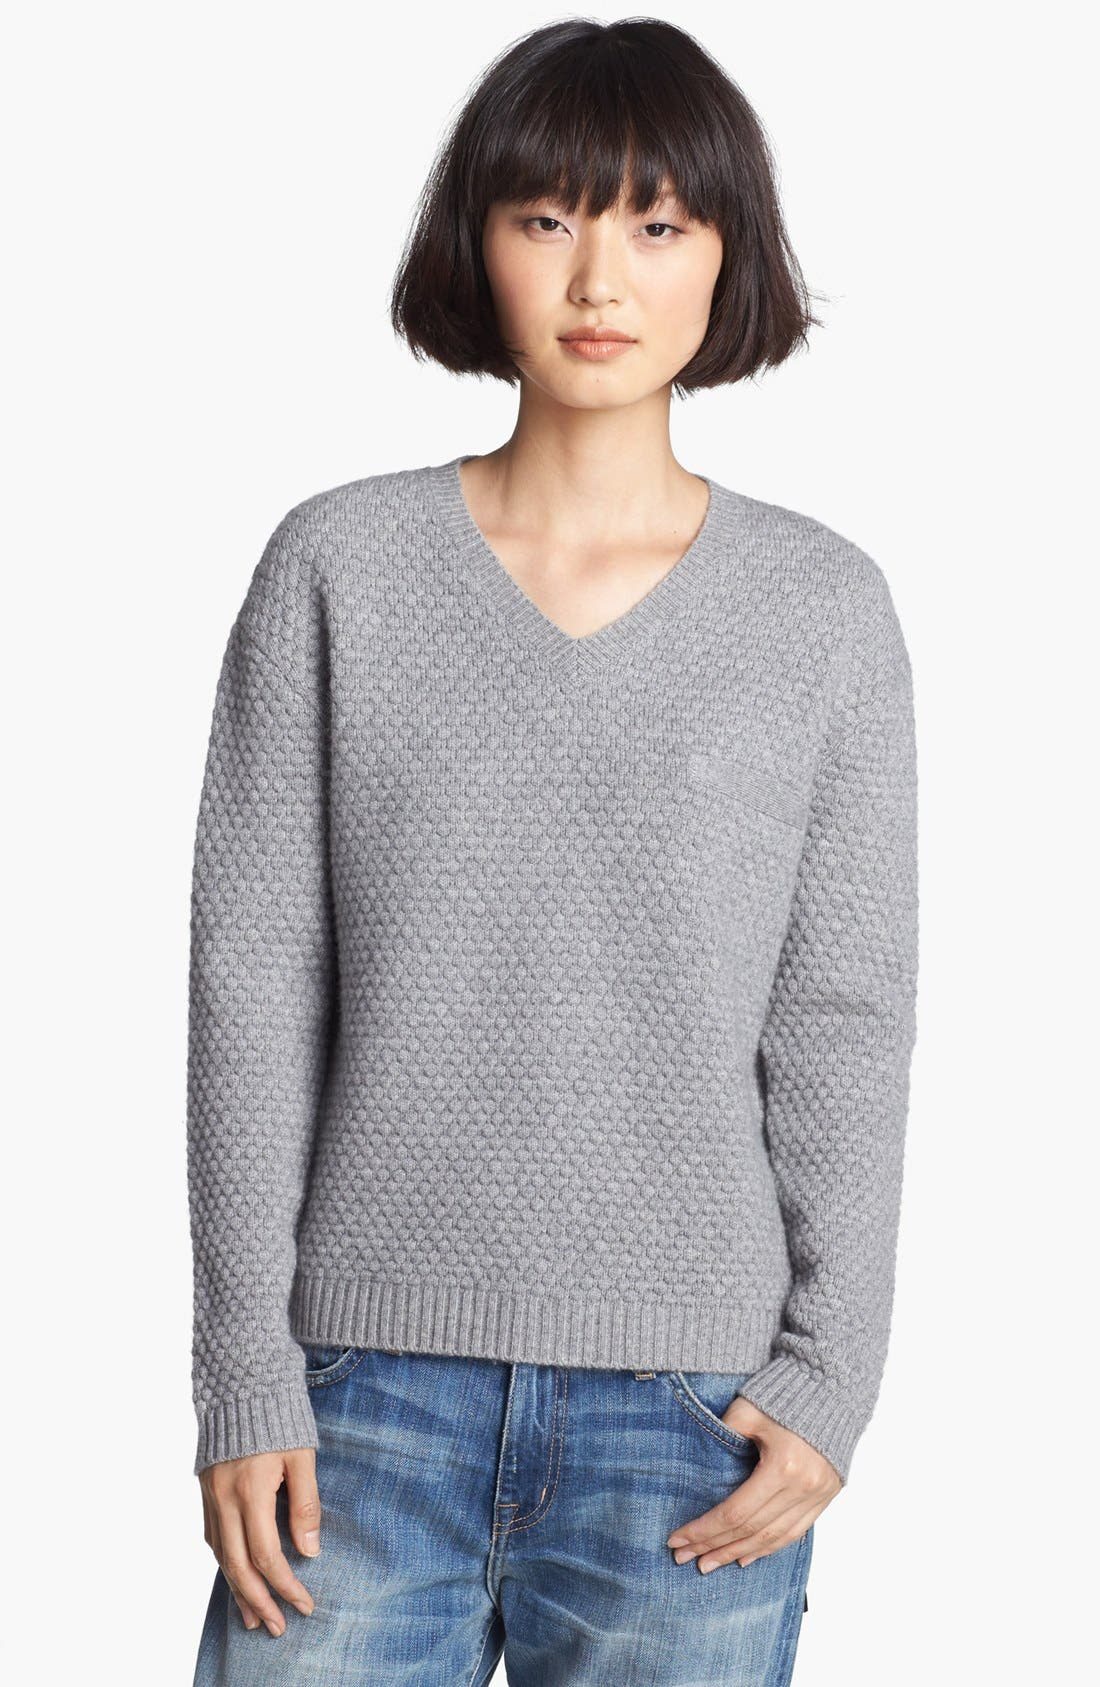 Alternate Image 1 Selected - Loma 'Joe' Popcorn Stitch Sweater